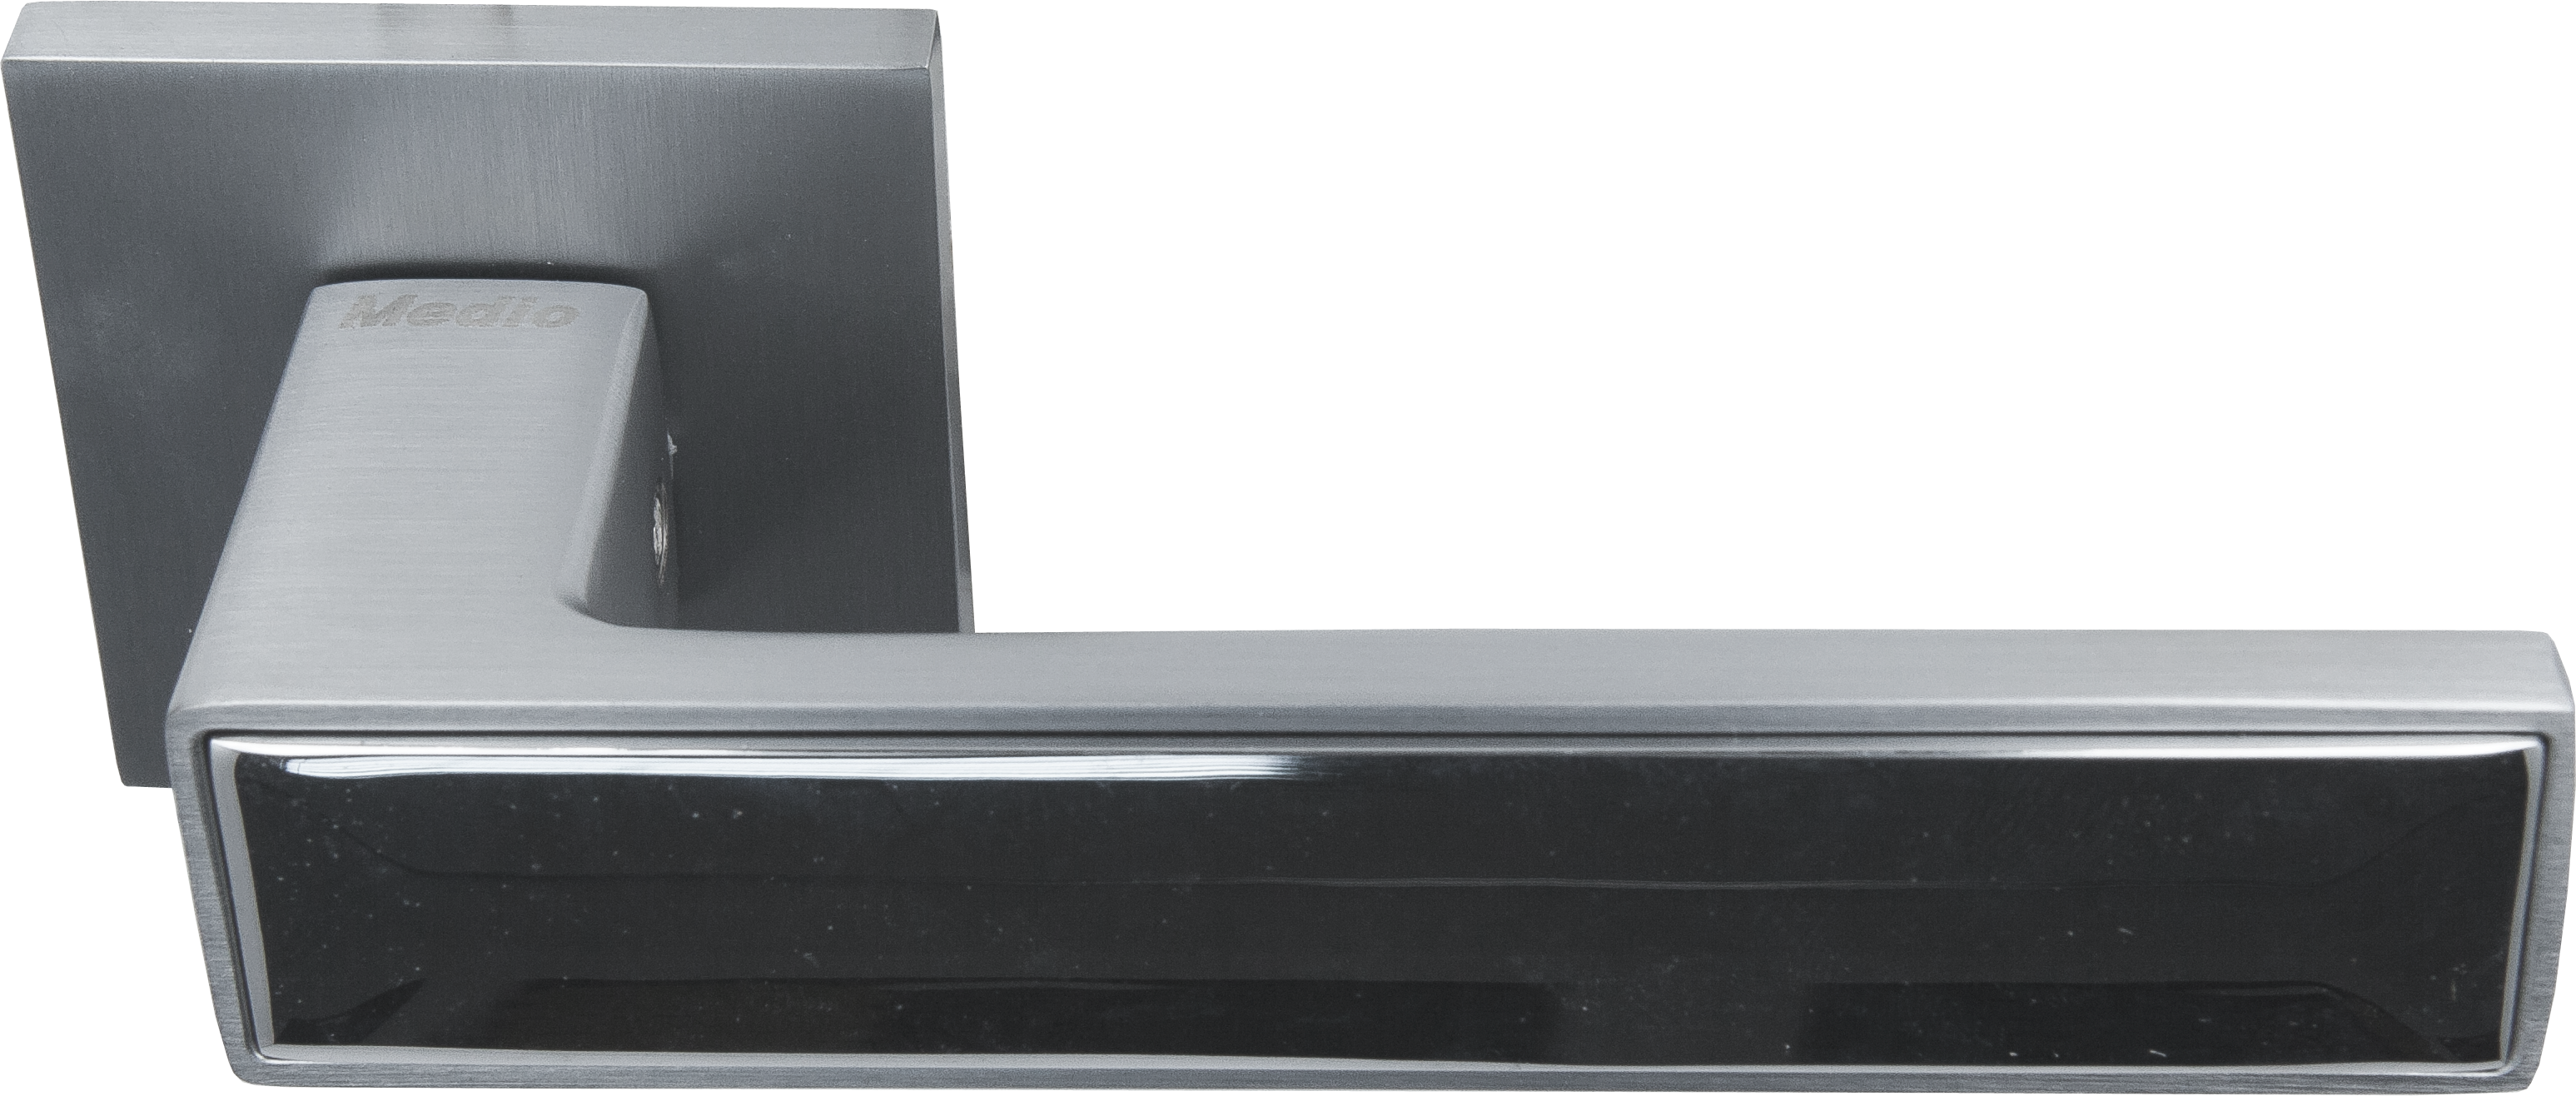 Ручка Медио M8226-56 MSCB/CP мат.хром/хром (10 шт)